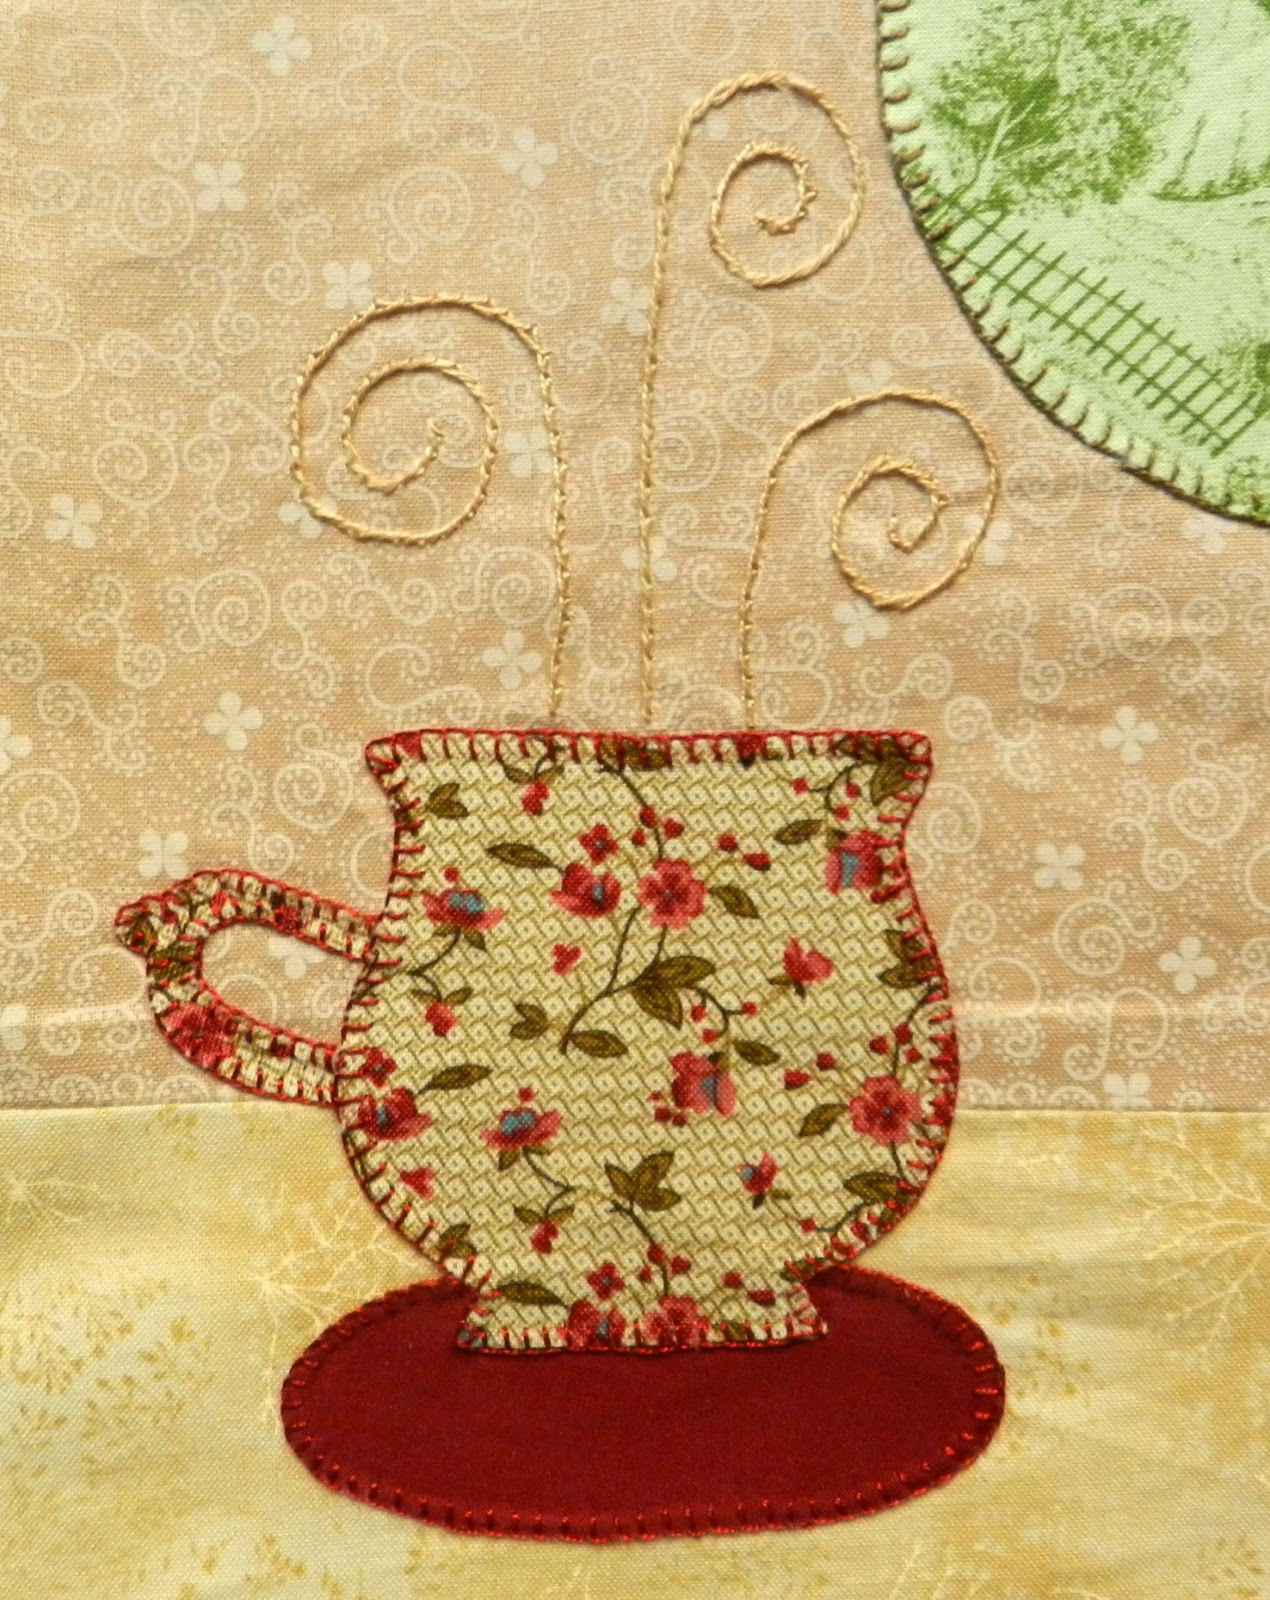 Mantel individual, hora del té, place mat, patchwork, bodegón patchwork, puzzles de tela, tetera patchwork